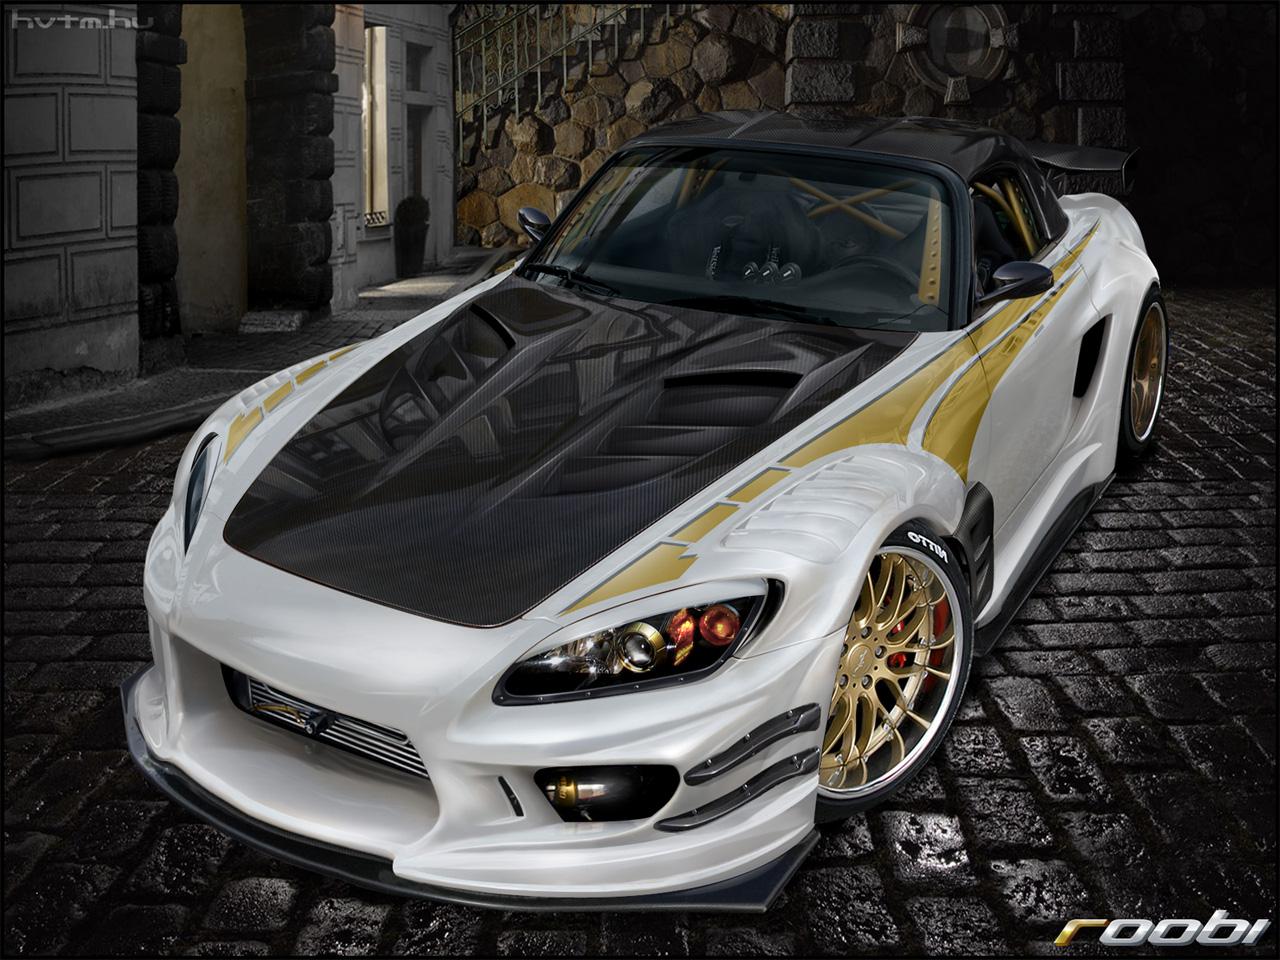 https://1.bp.blogspot.com/-rIJCiVarEkM/TZ2aCISFa9I/AAAAAAAAAB8/Uqcc6s_FpHM/s1600/honda-s2000-car-wallpaper.jpg